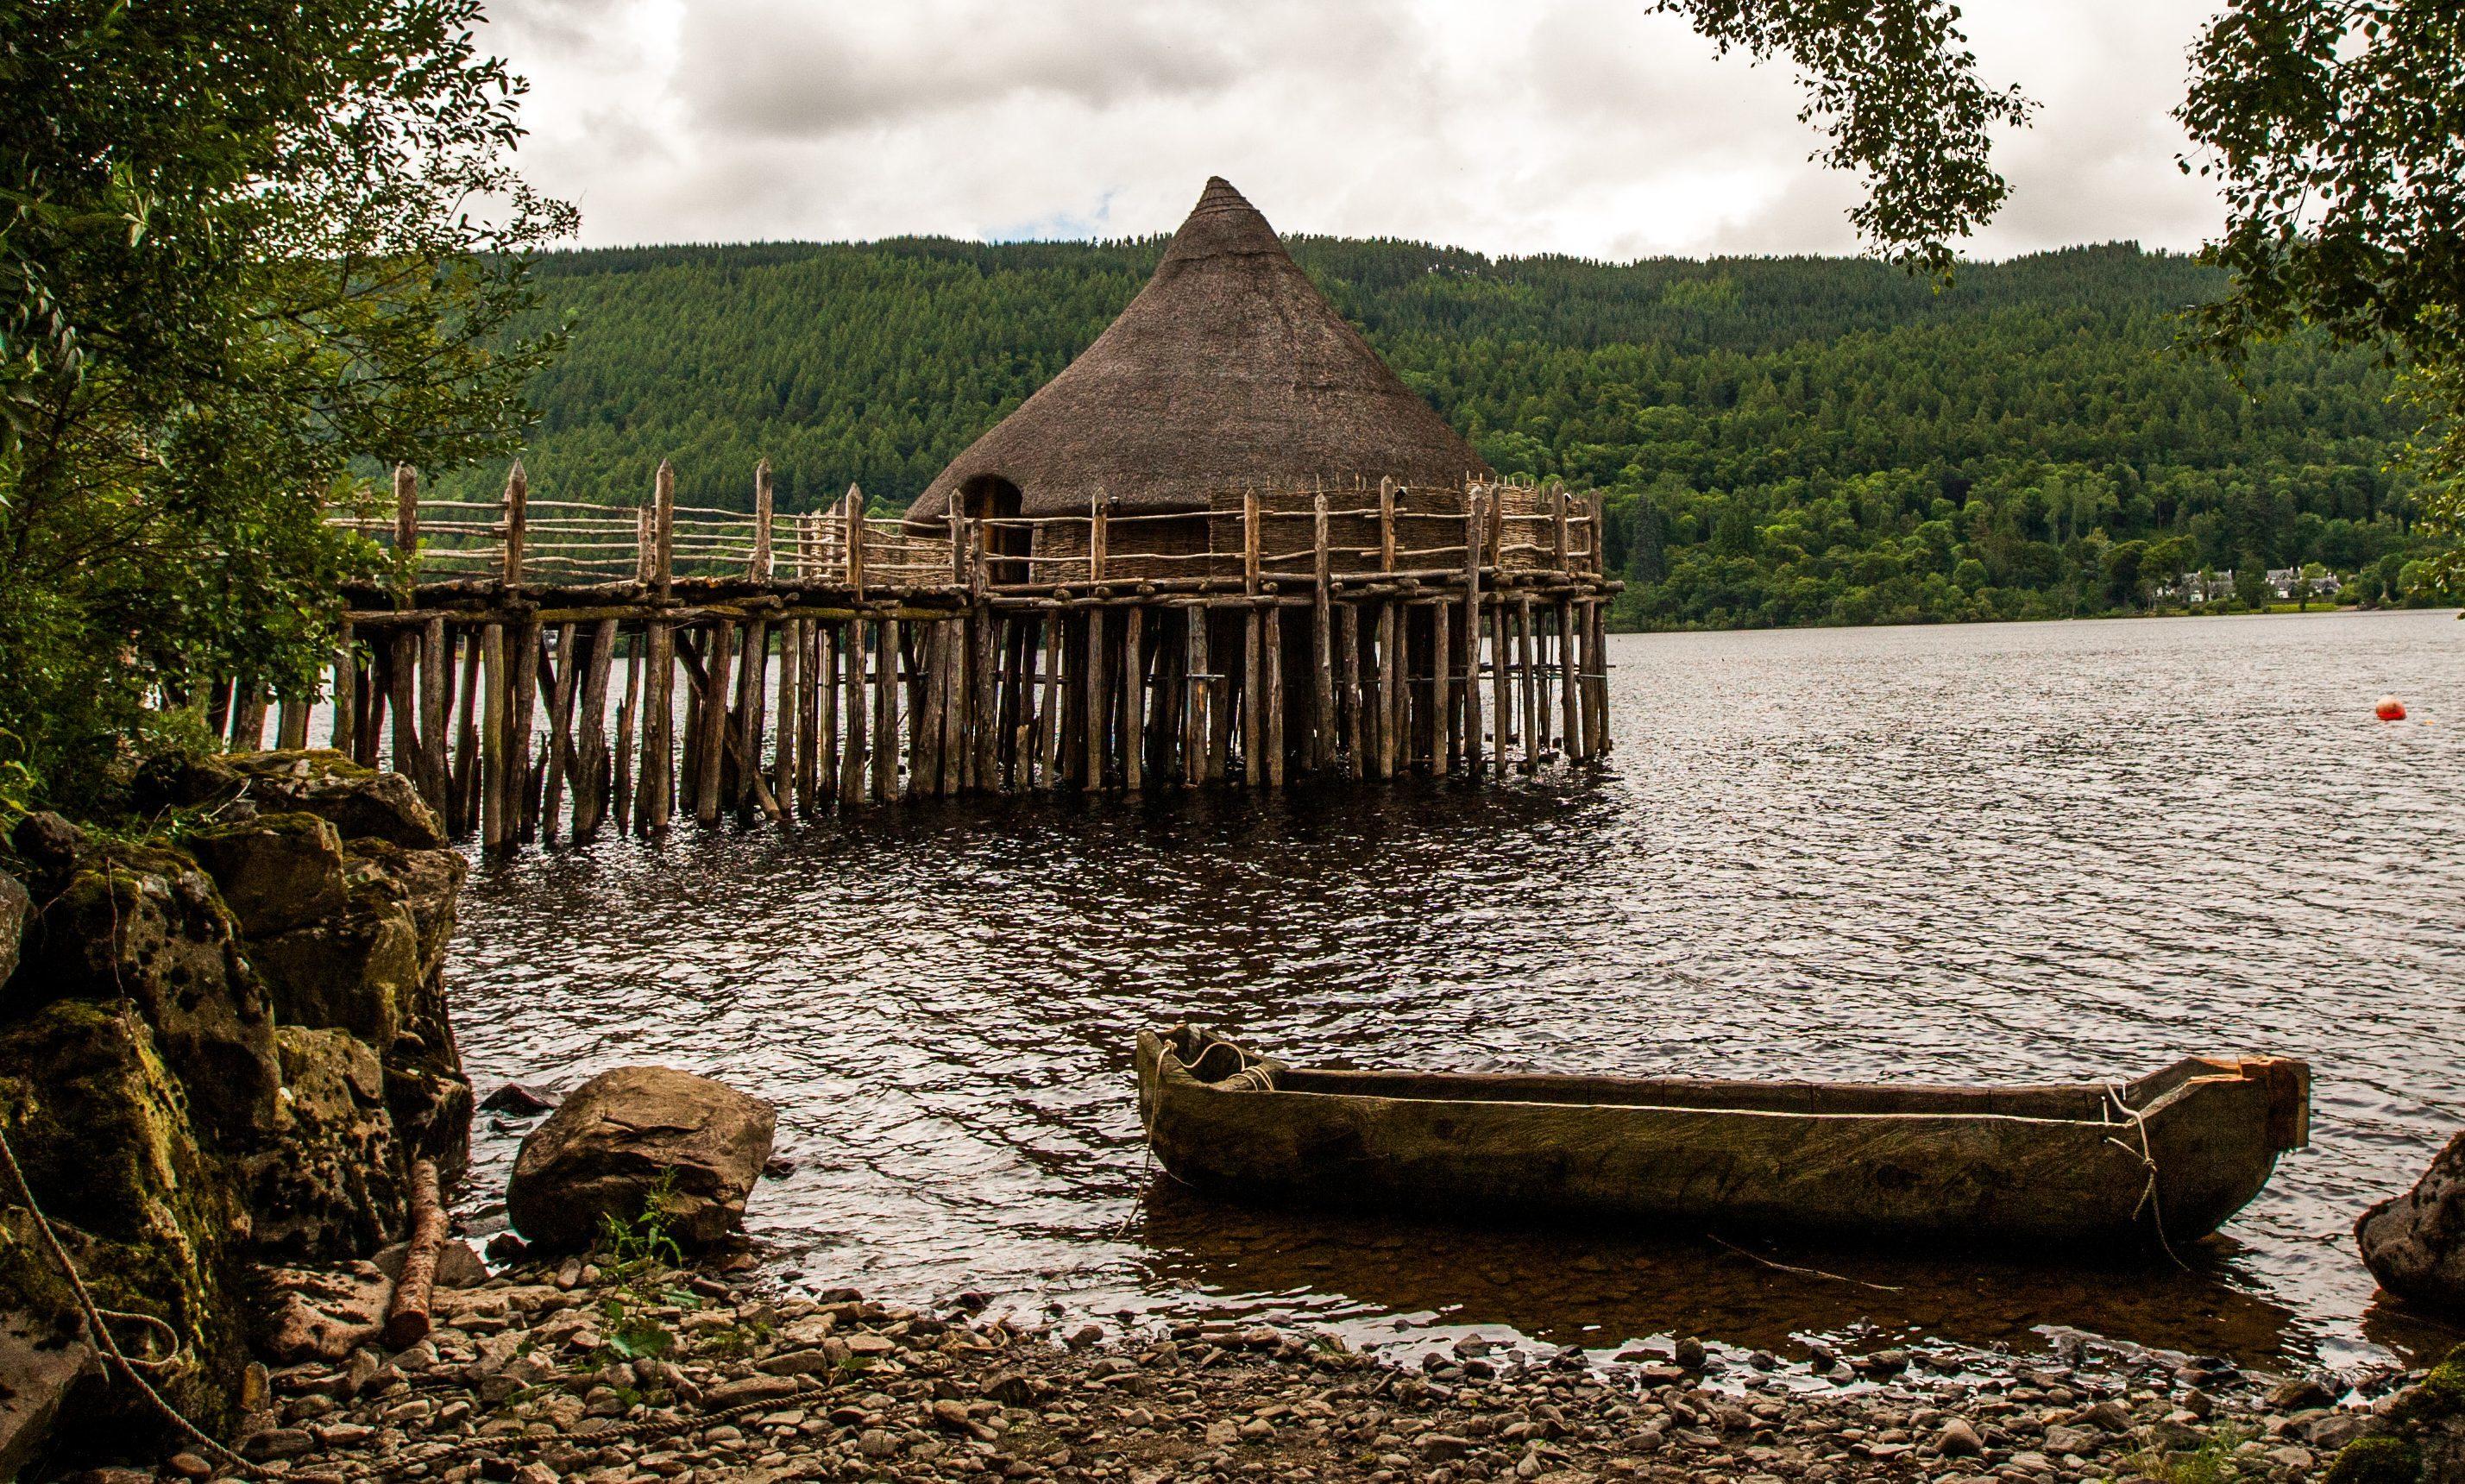 The Scottish Crannog Centre at Loch Tay.